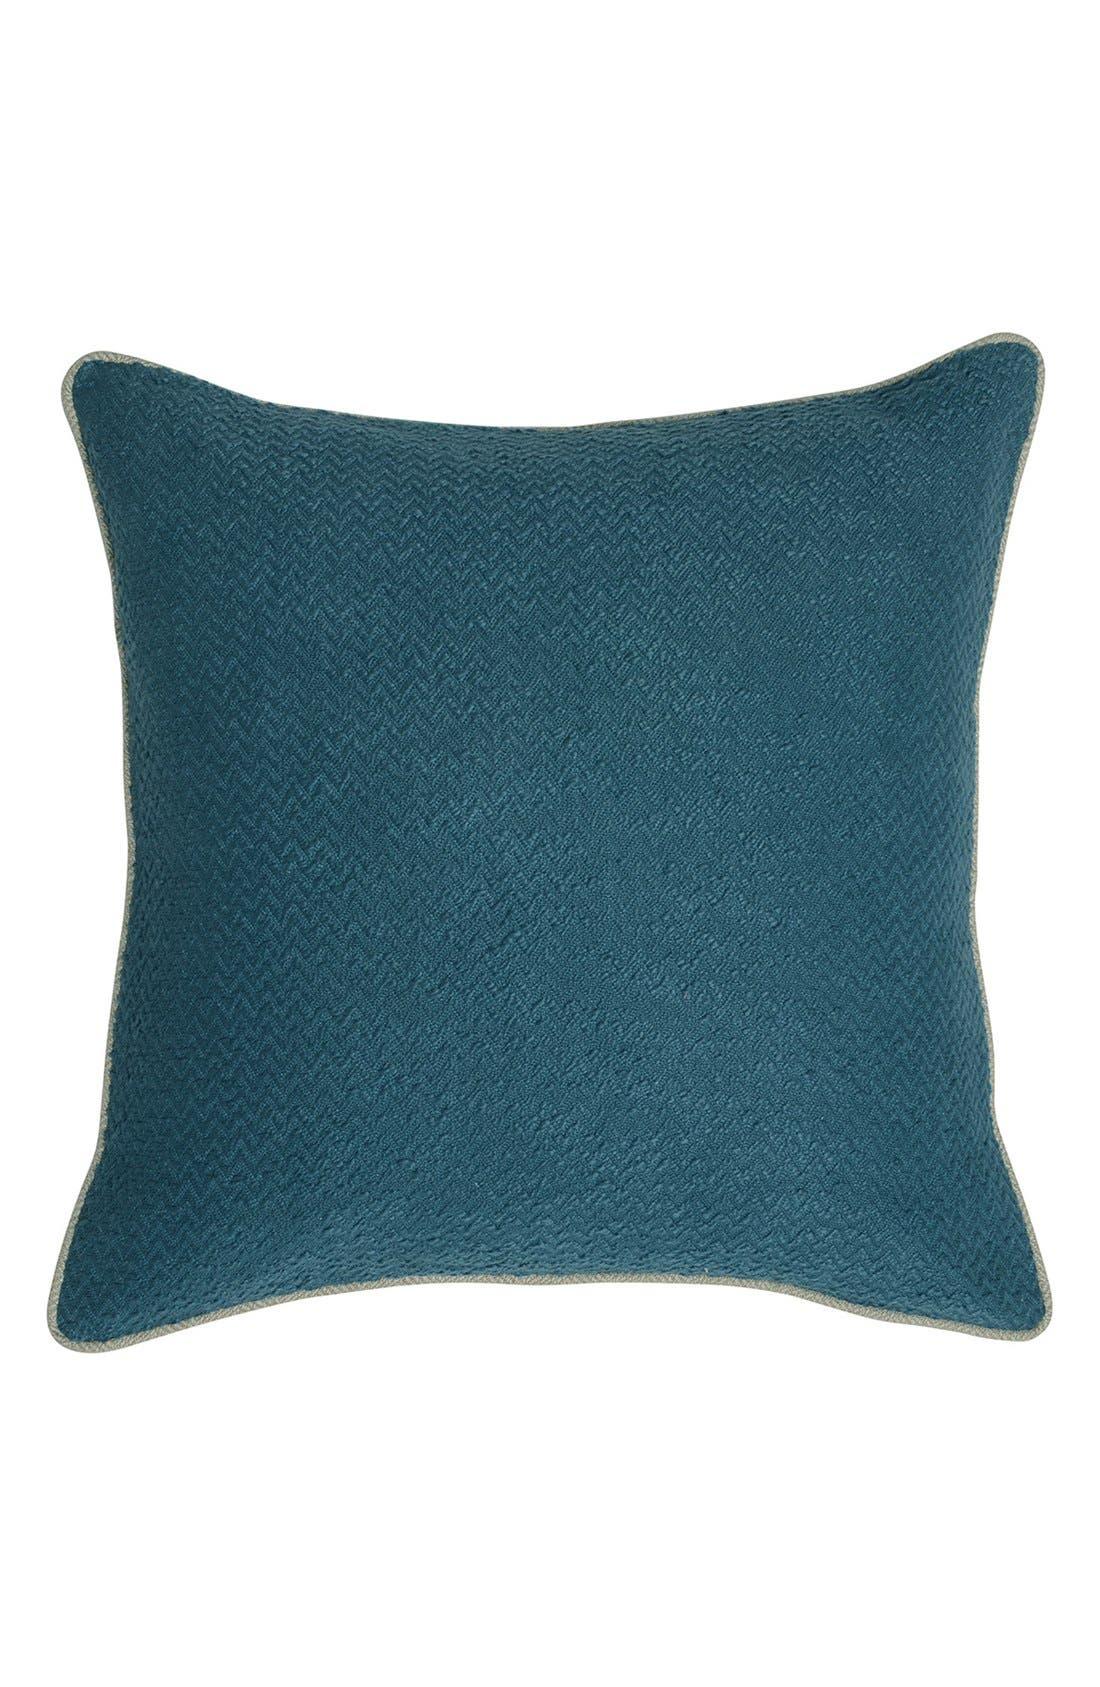 'Razia' Pillow,                         Main,                         color, Marine Blue